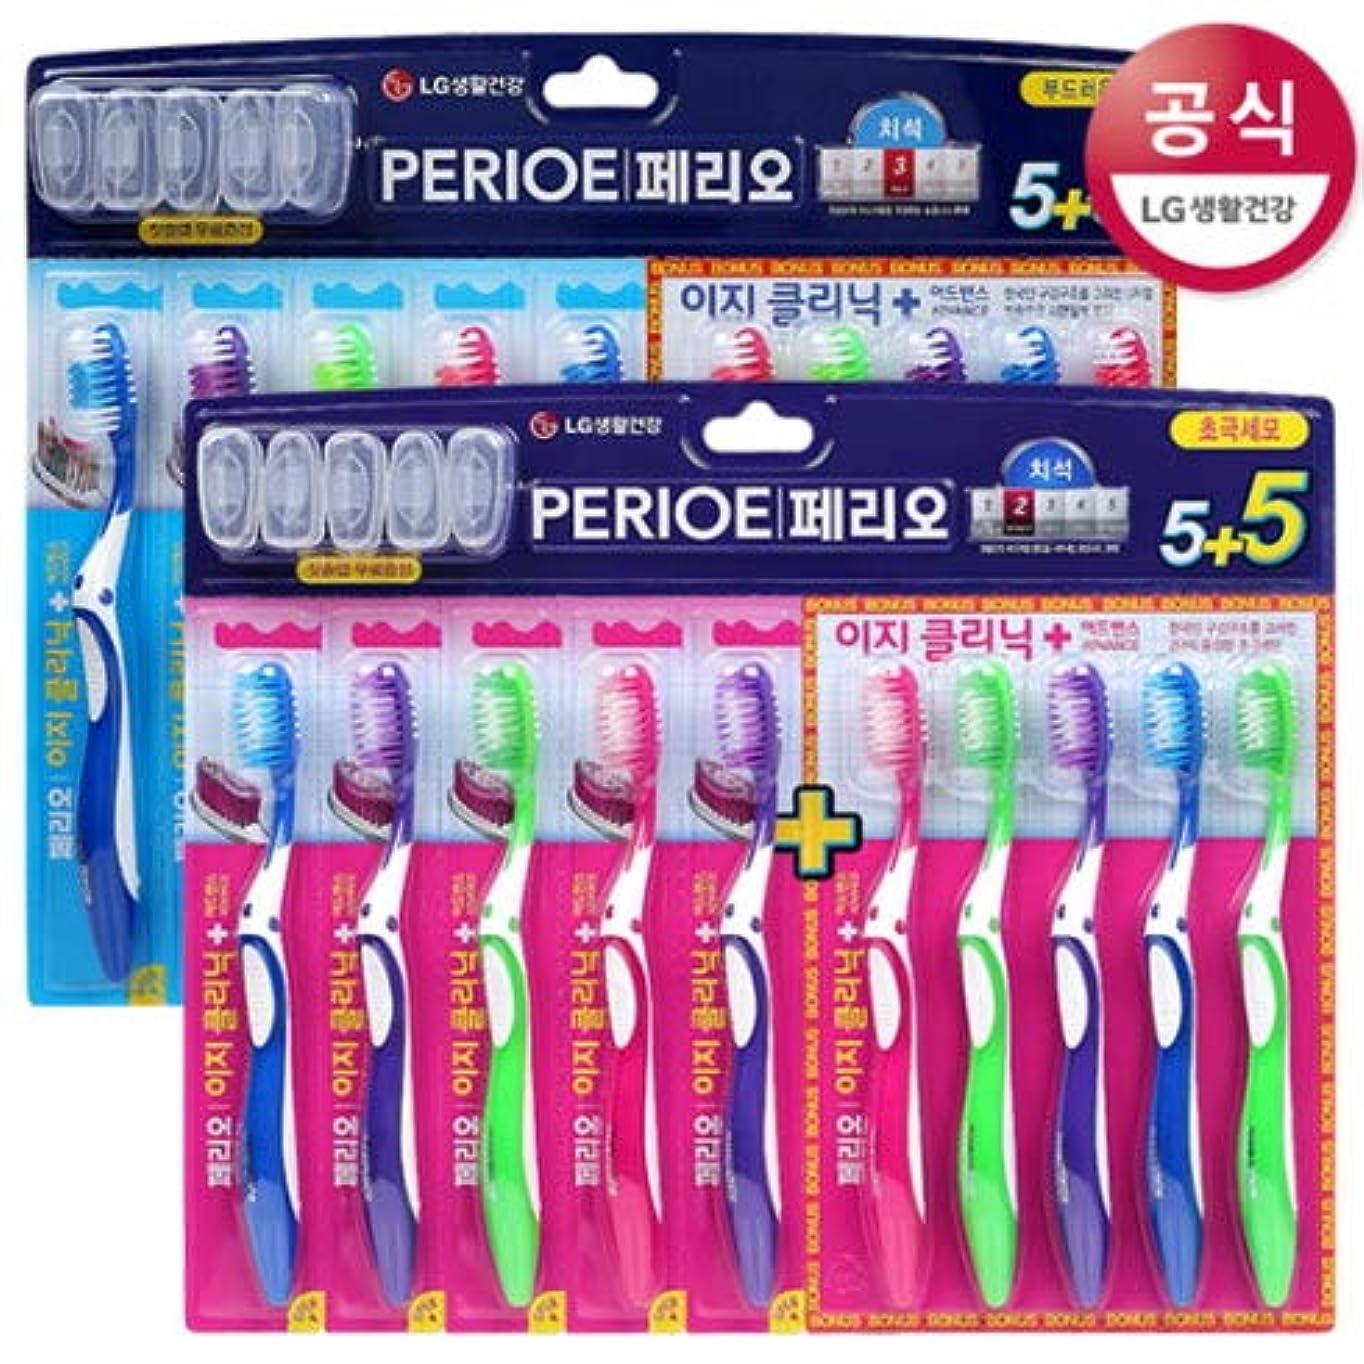 [LG HnB] Perio Easy Clinical Advance Toothbrush/ペリオでクリニックアドバンス歯ブラシ 10の口x2個(海外直送品)